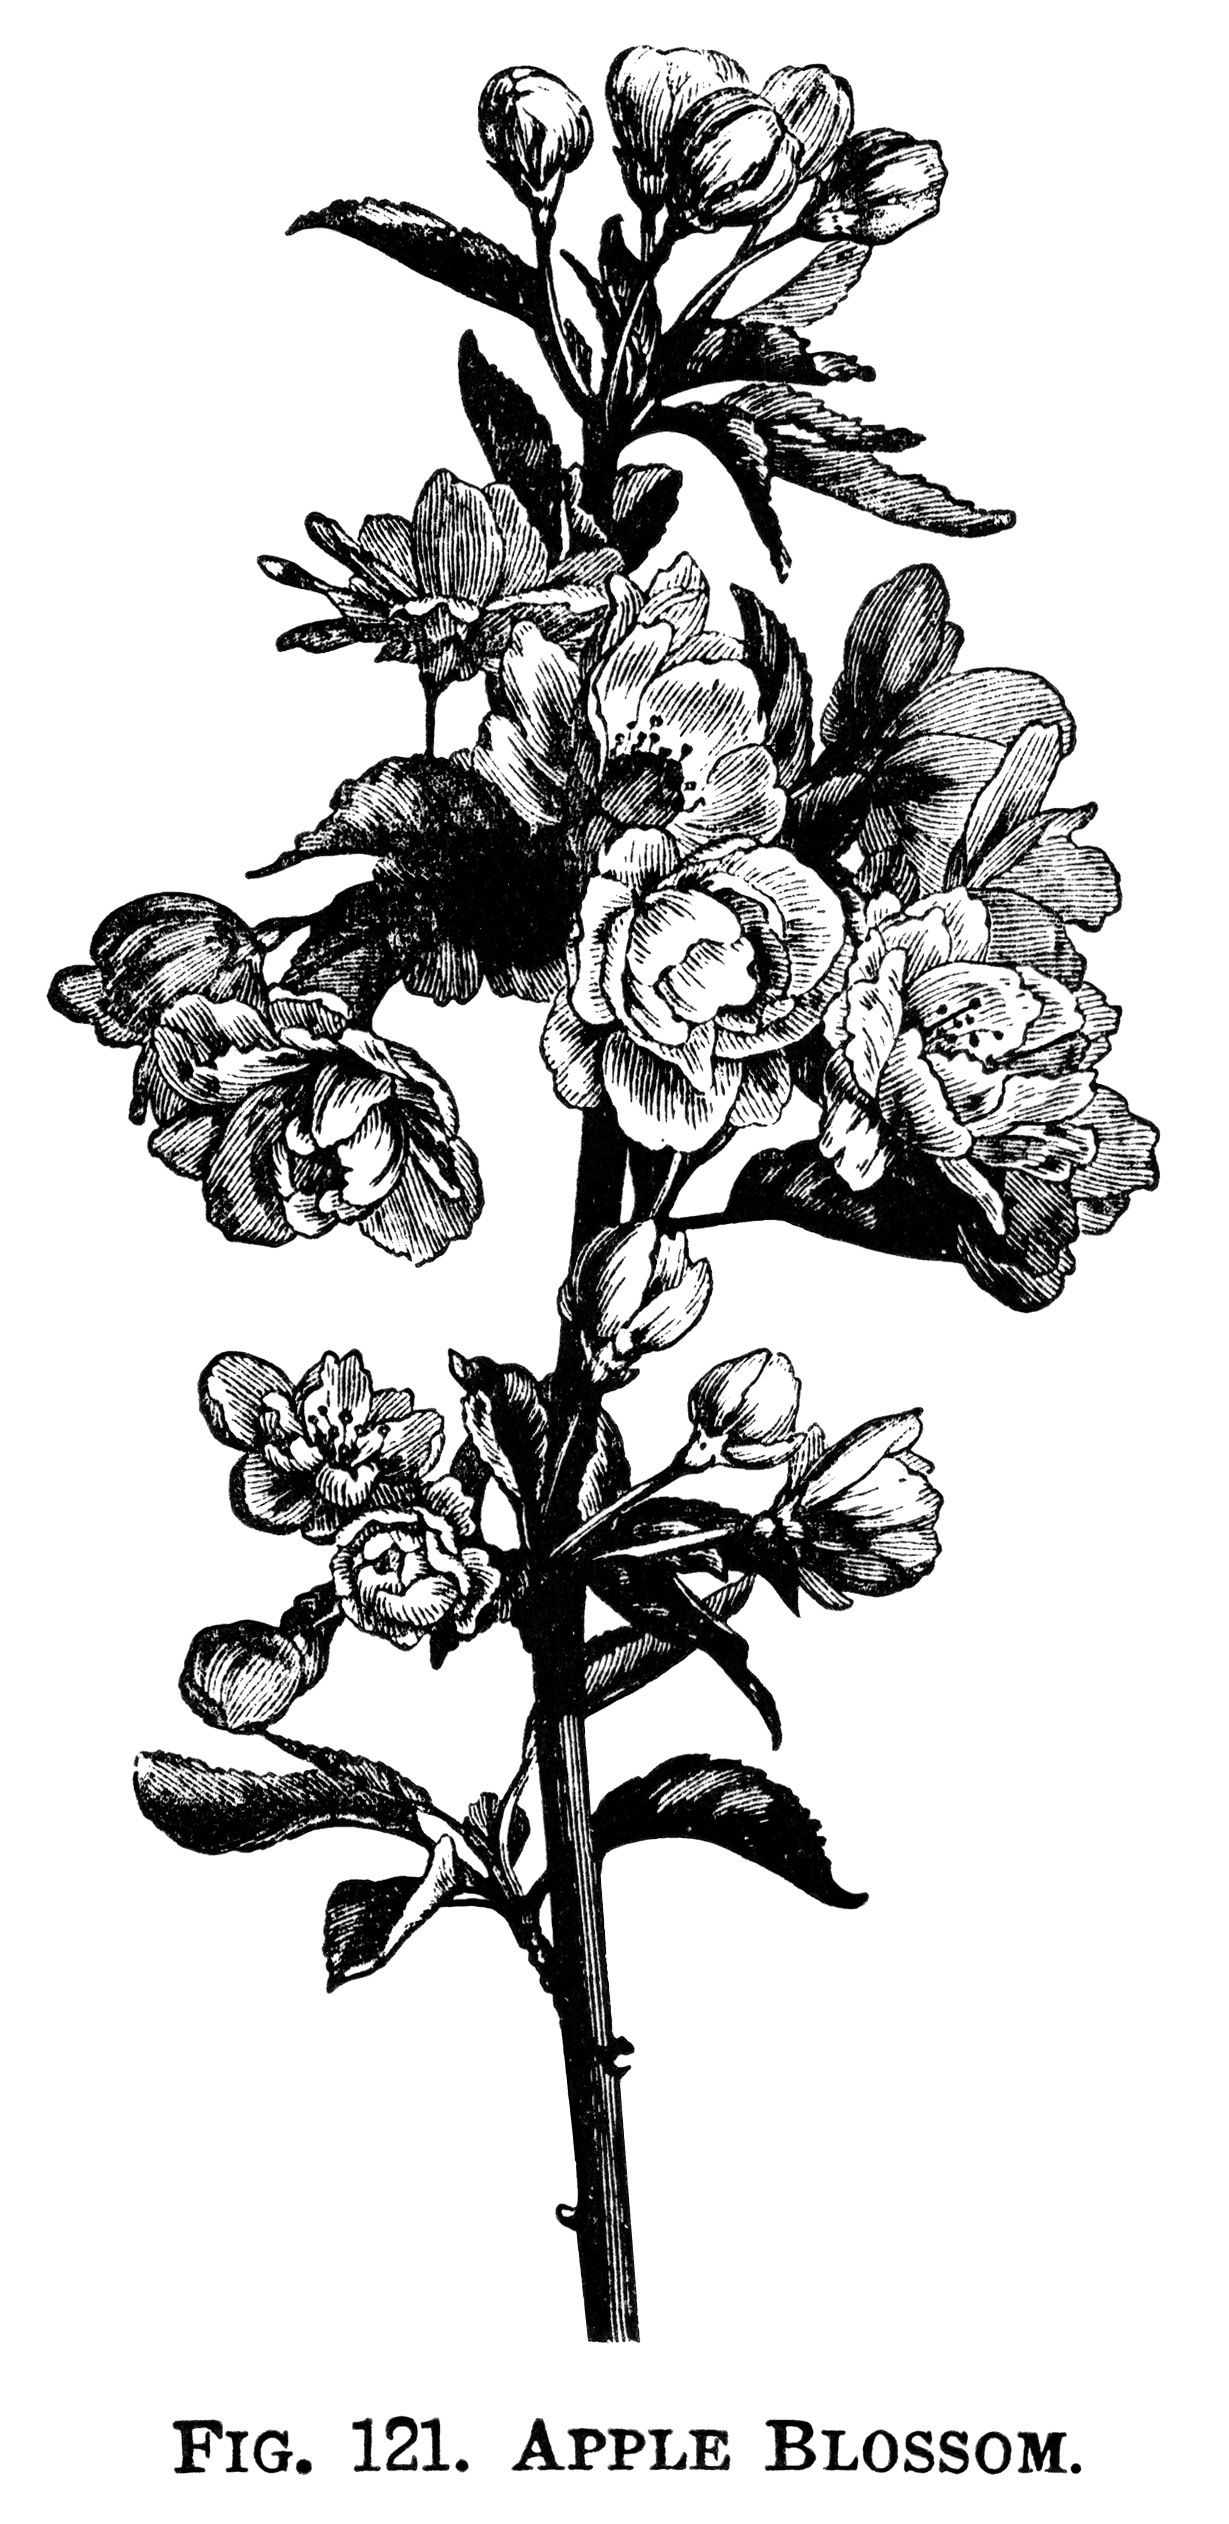 Apple Blossom Clip Art Flowering Tree Branch Flower Illustration Vintage Botanical Engraving